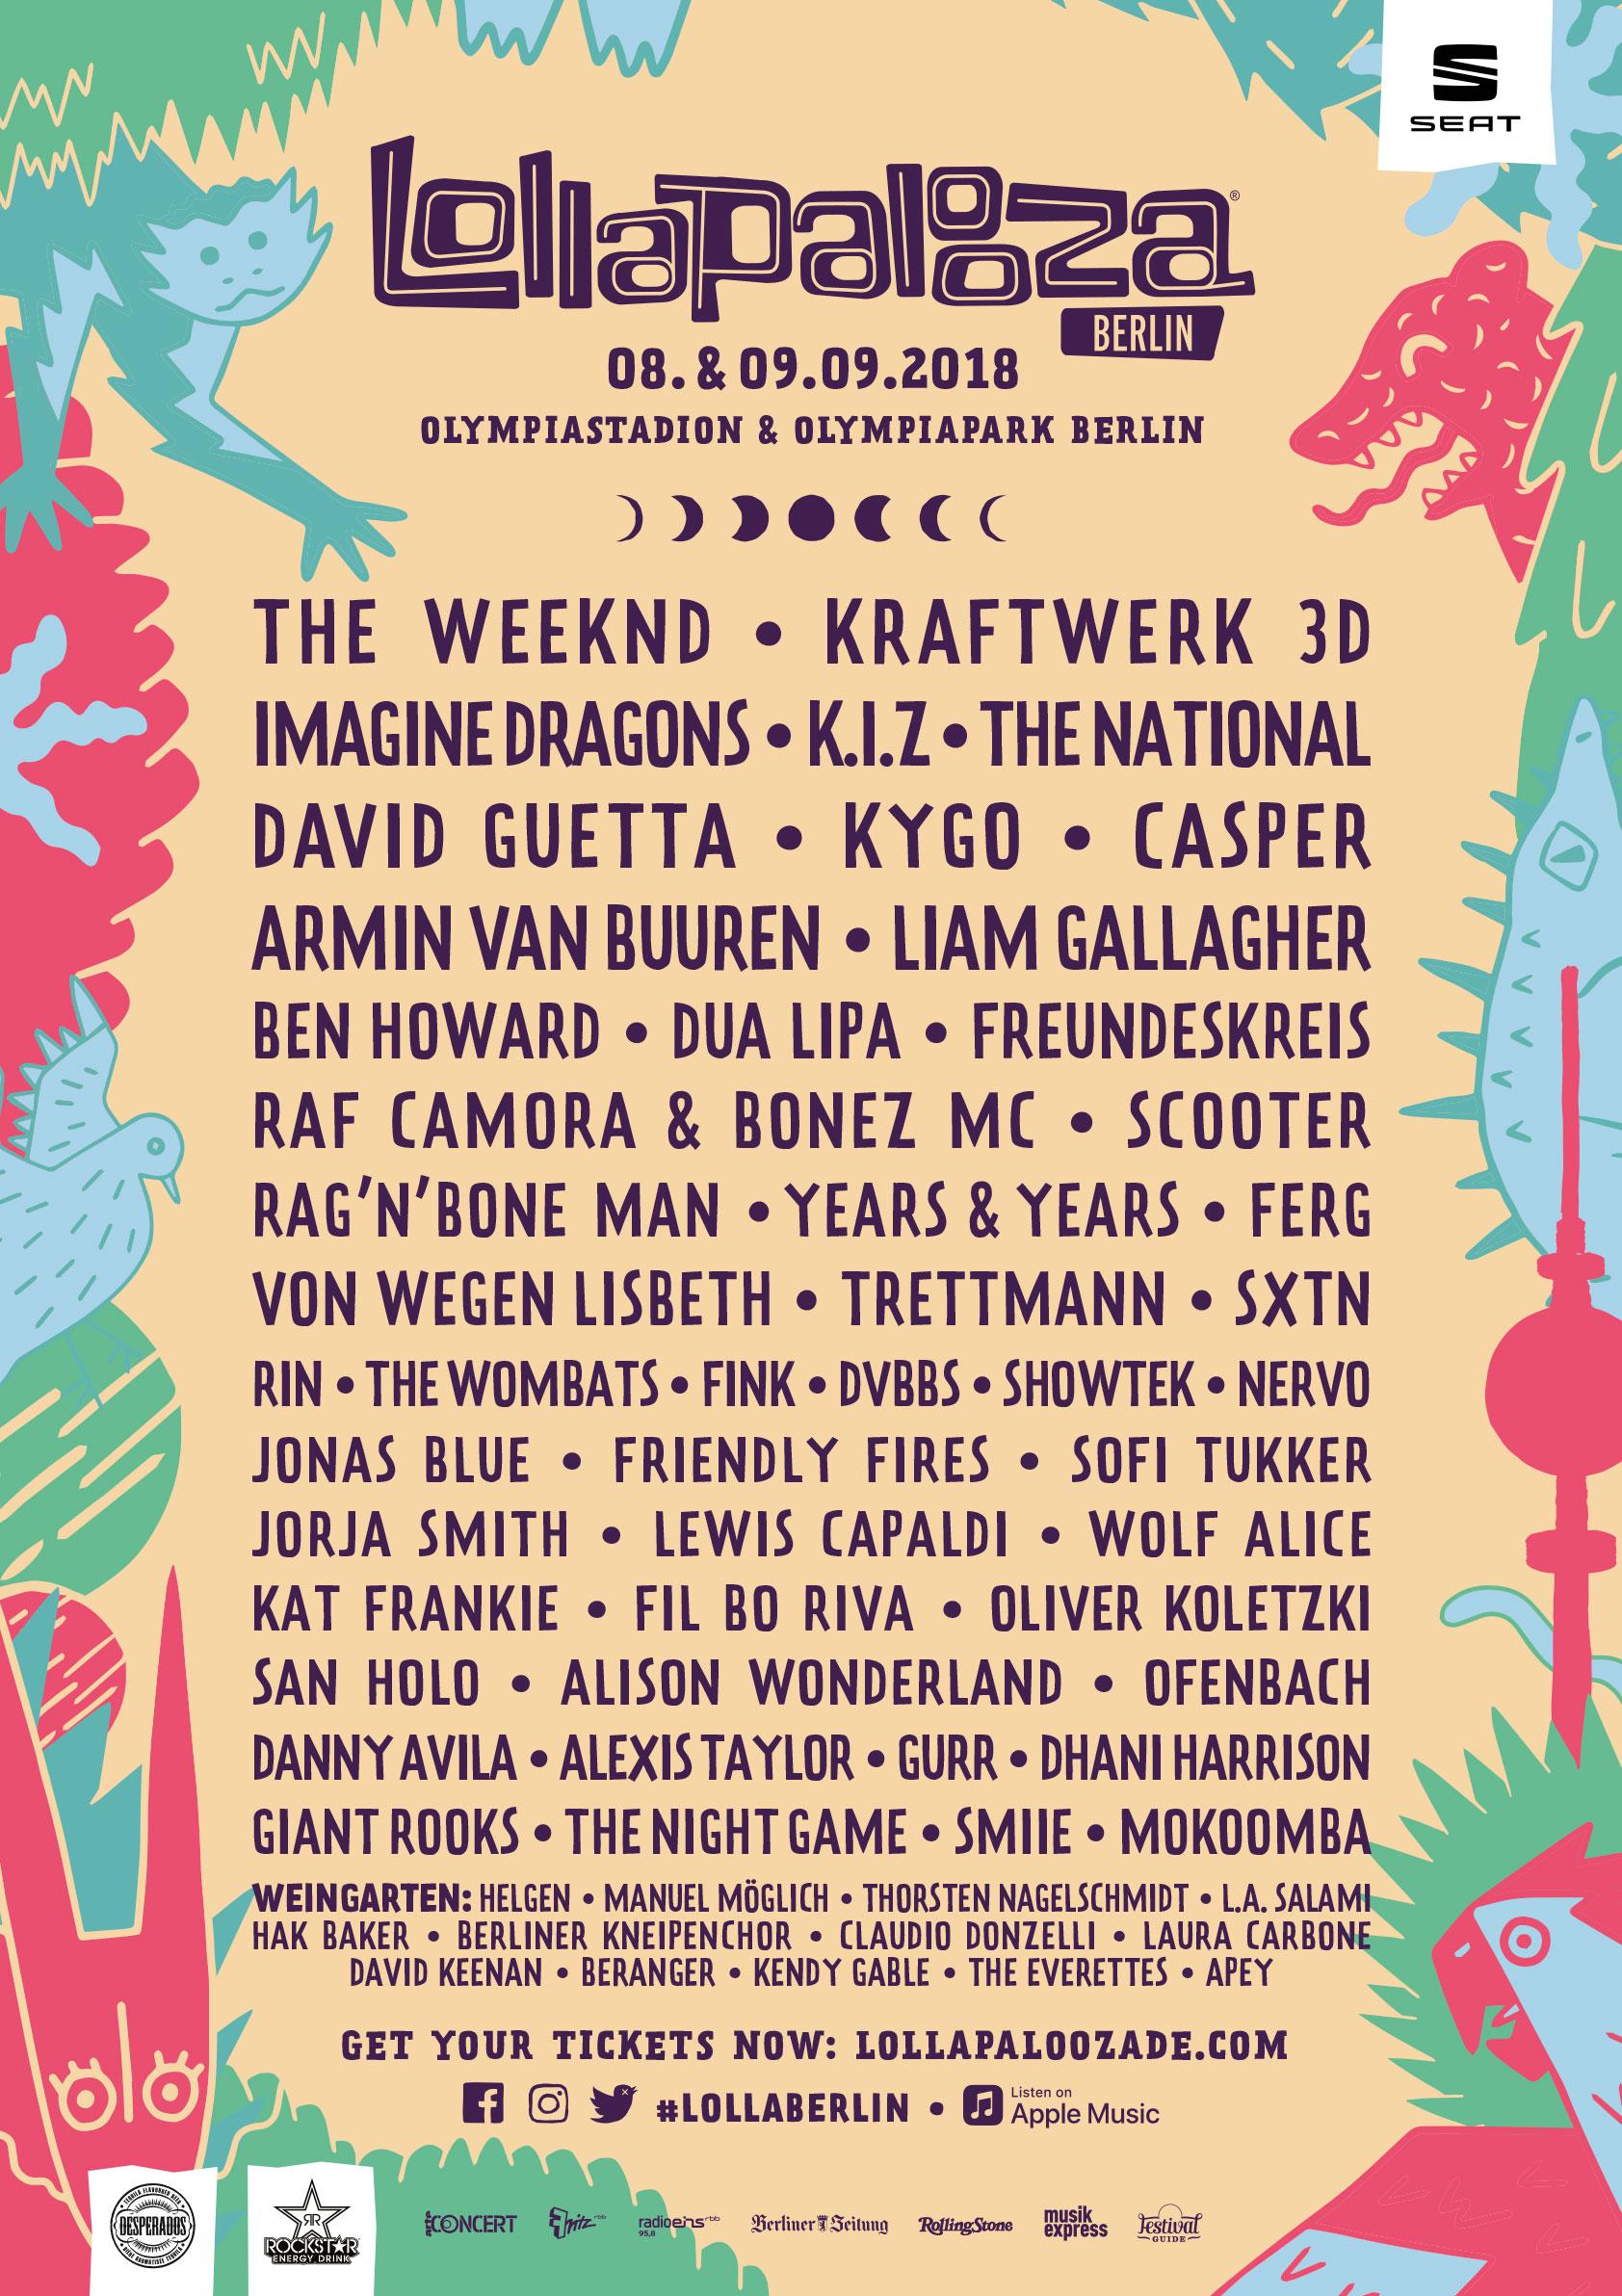 Das Line-Up ist komplett - Lollapalooza am 08 & 09 2018 in